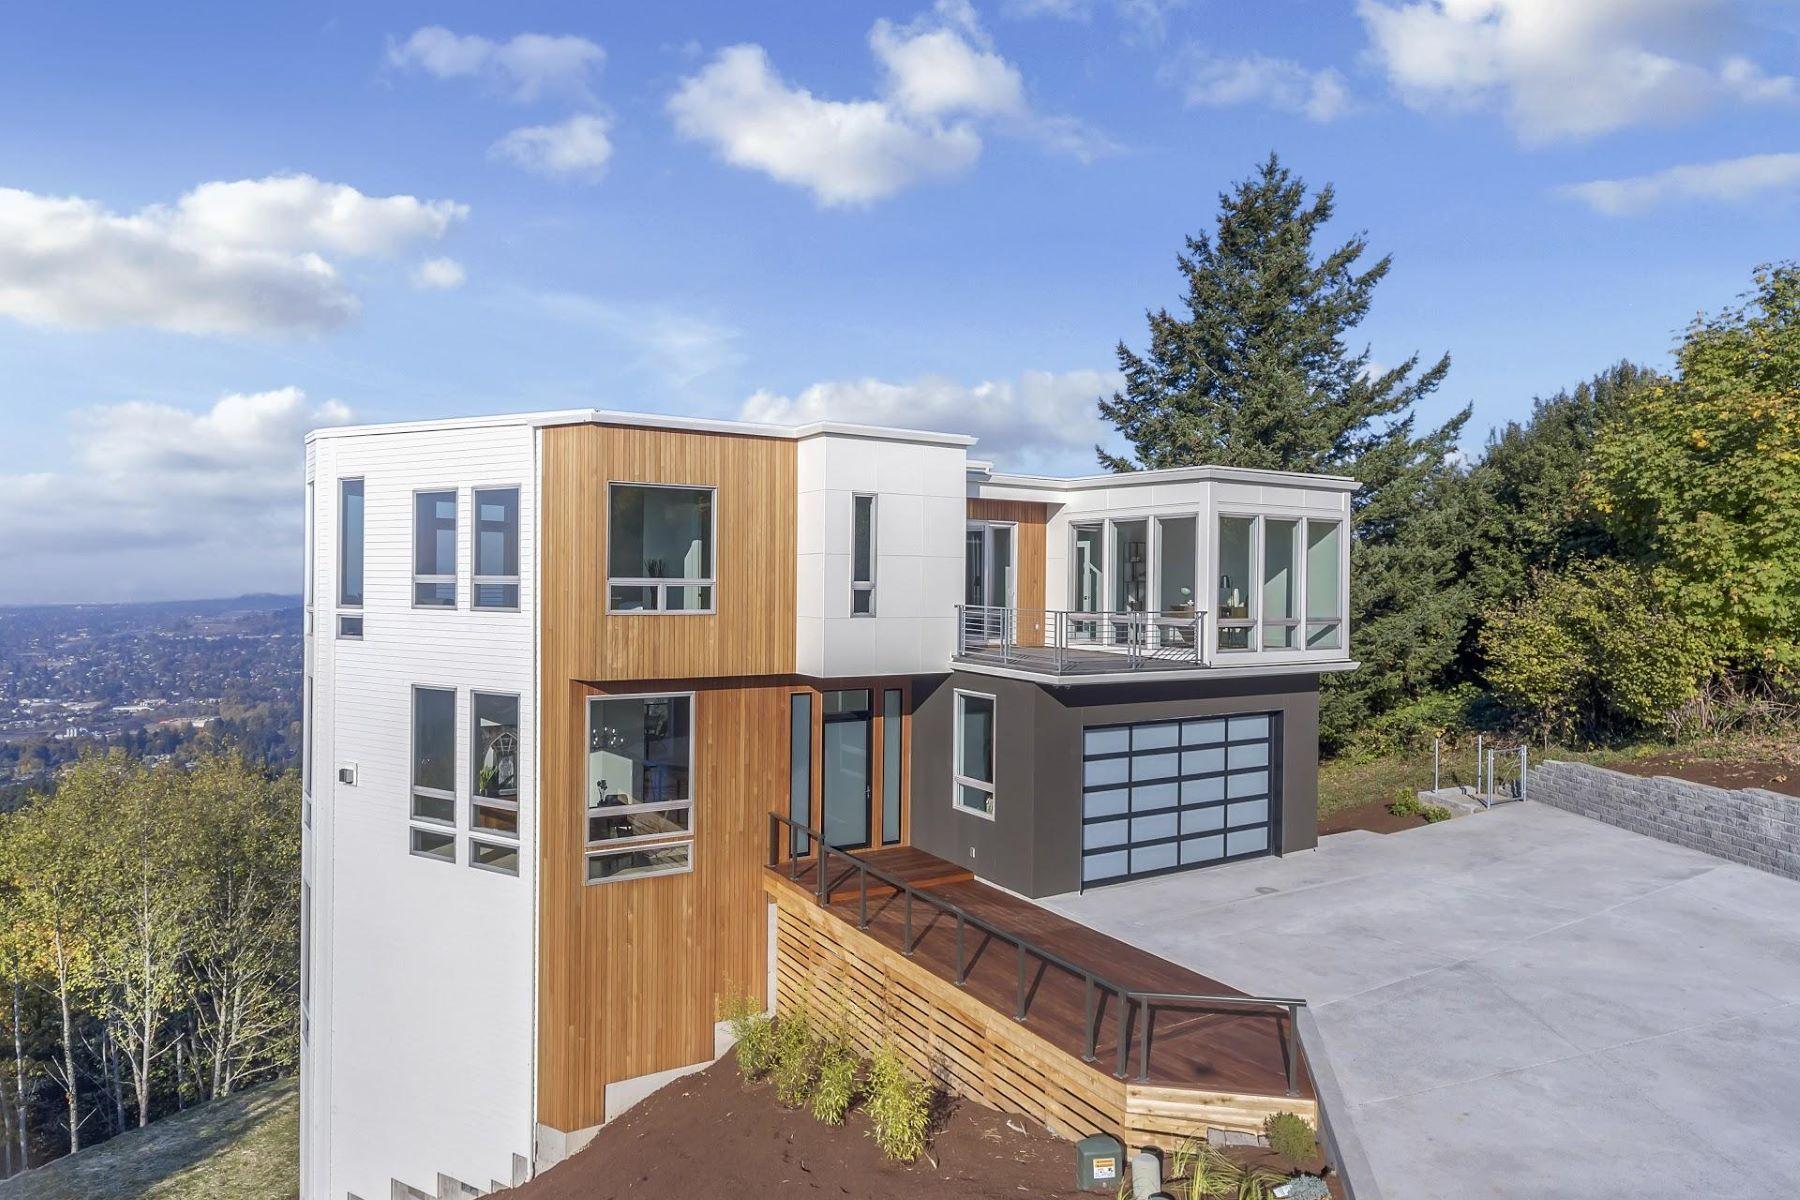 Other Residential Homes για την Πώληση στο 10699 SE RIDGEWAY DR Happy Valley, OR 97086 Happy Valley, Ορεγκον 97086 Ηνωμένες Πολιτείες